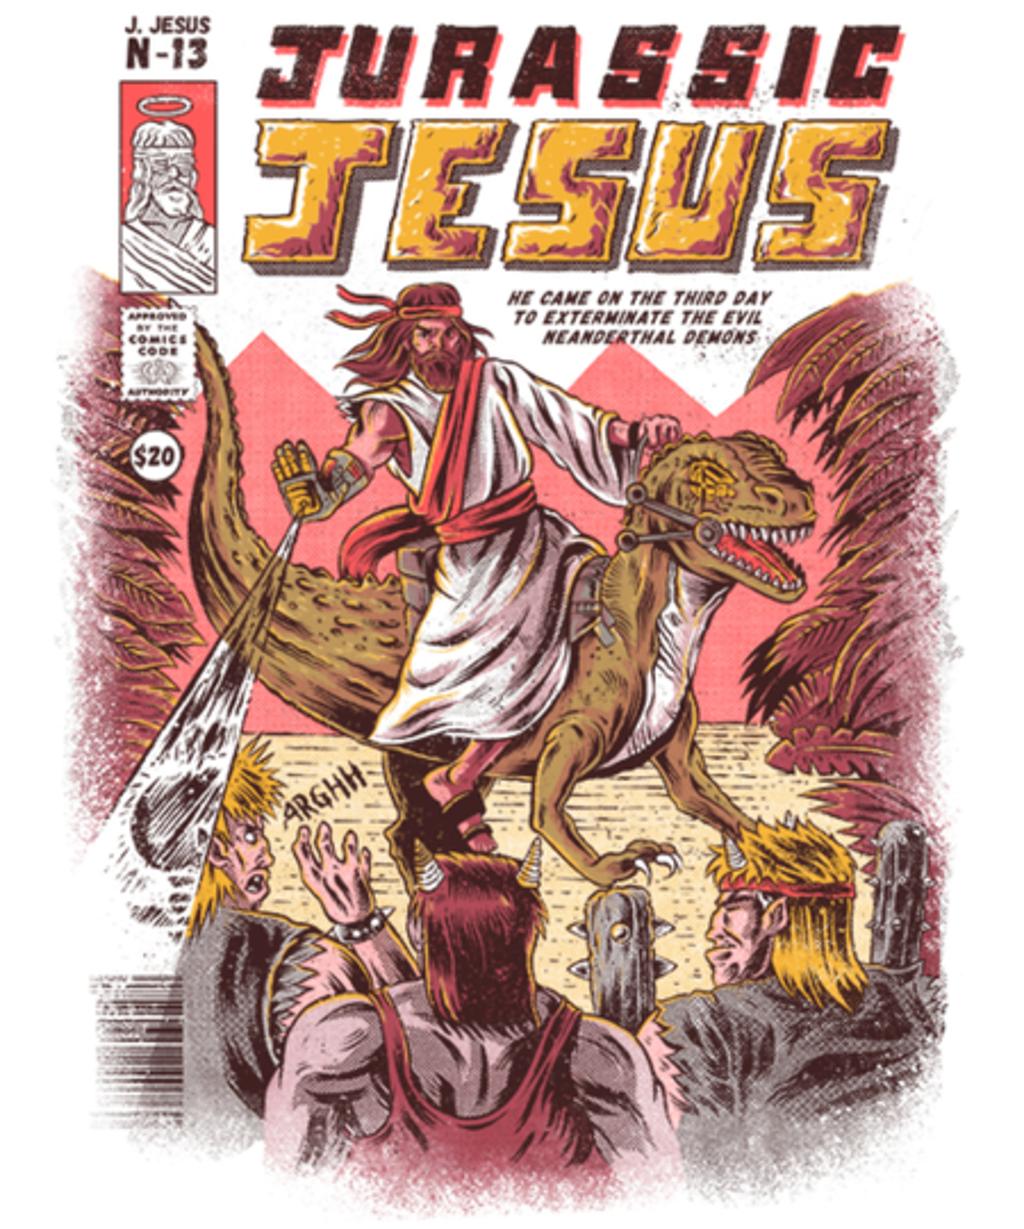 Qwertee: Jurassic Jesus